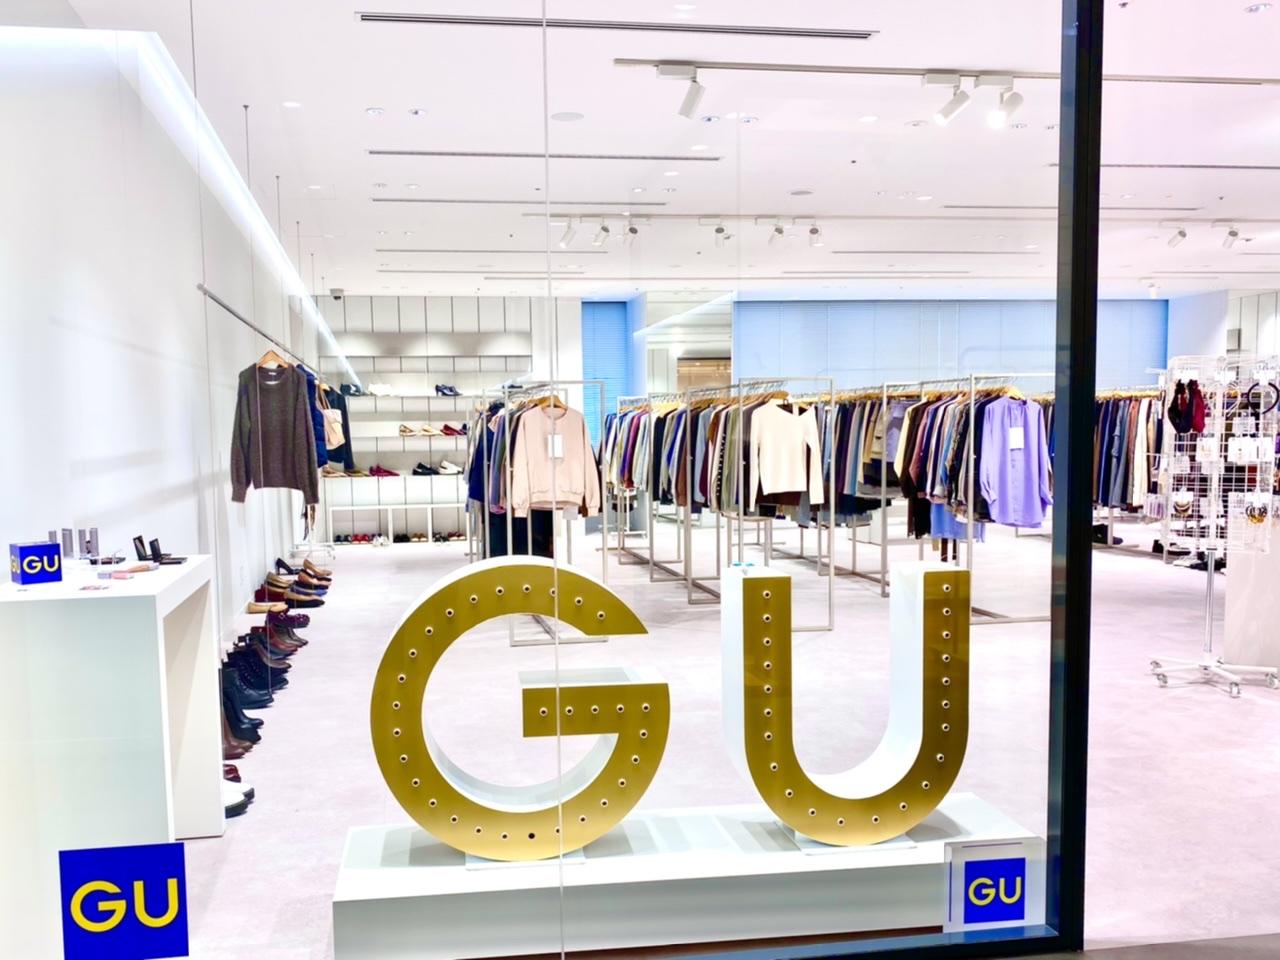 【GU独占取材】『GU』ショールームへ潜入! プレスにこっそり聞いた「本気買いアウター」7選☆ PhotoGallery_1_1